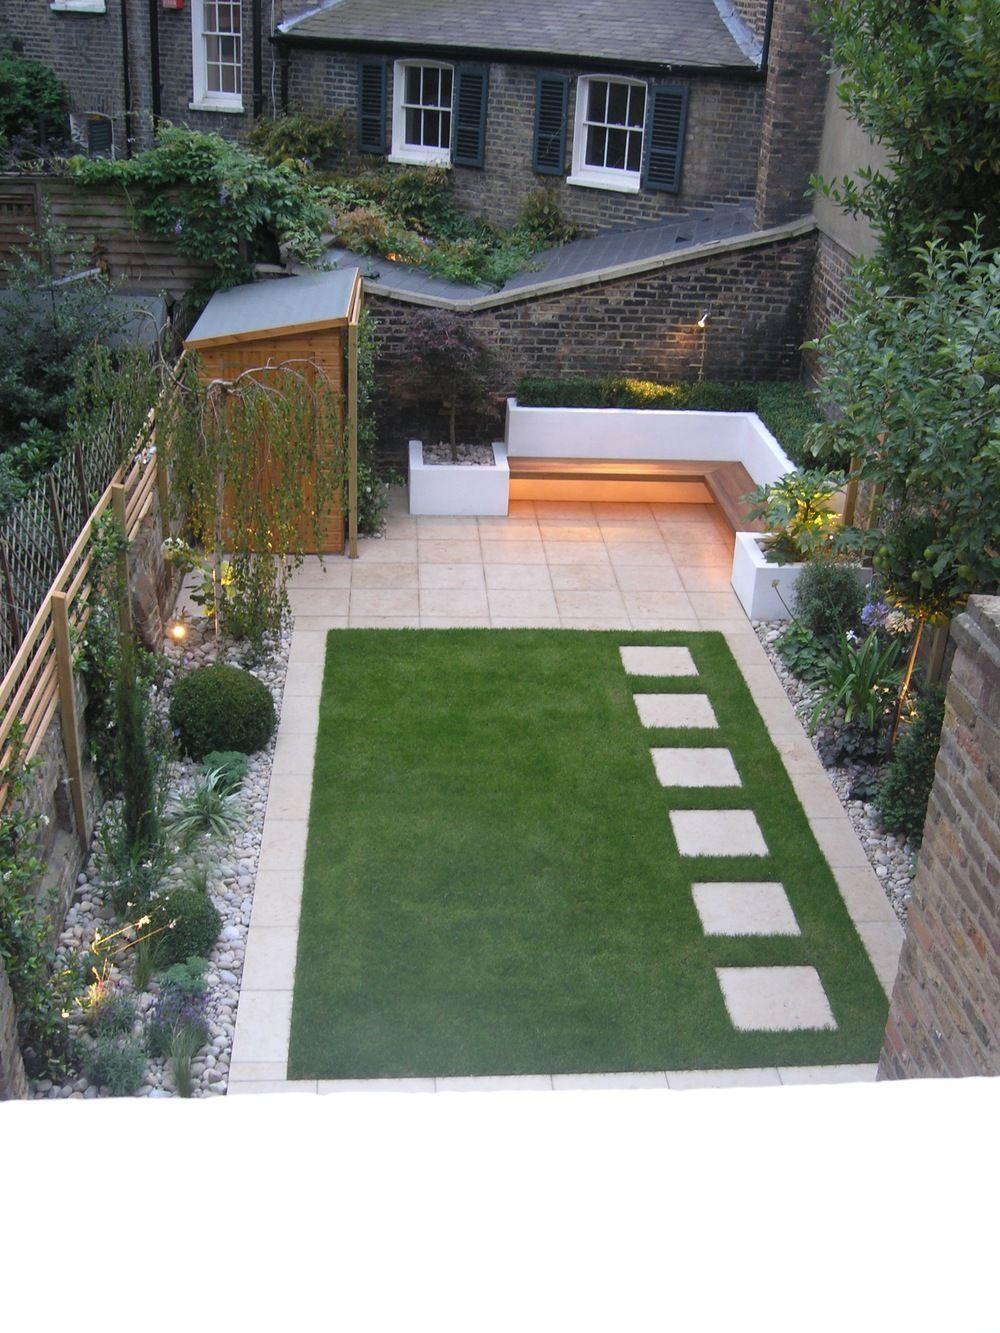 P7260022 Jpg Moderngarden Back Garden Design Small Backyard Landscaping Small Back Gardens